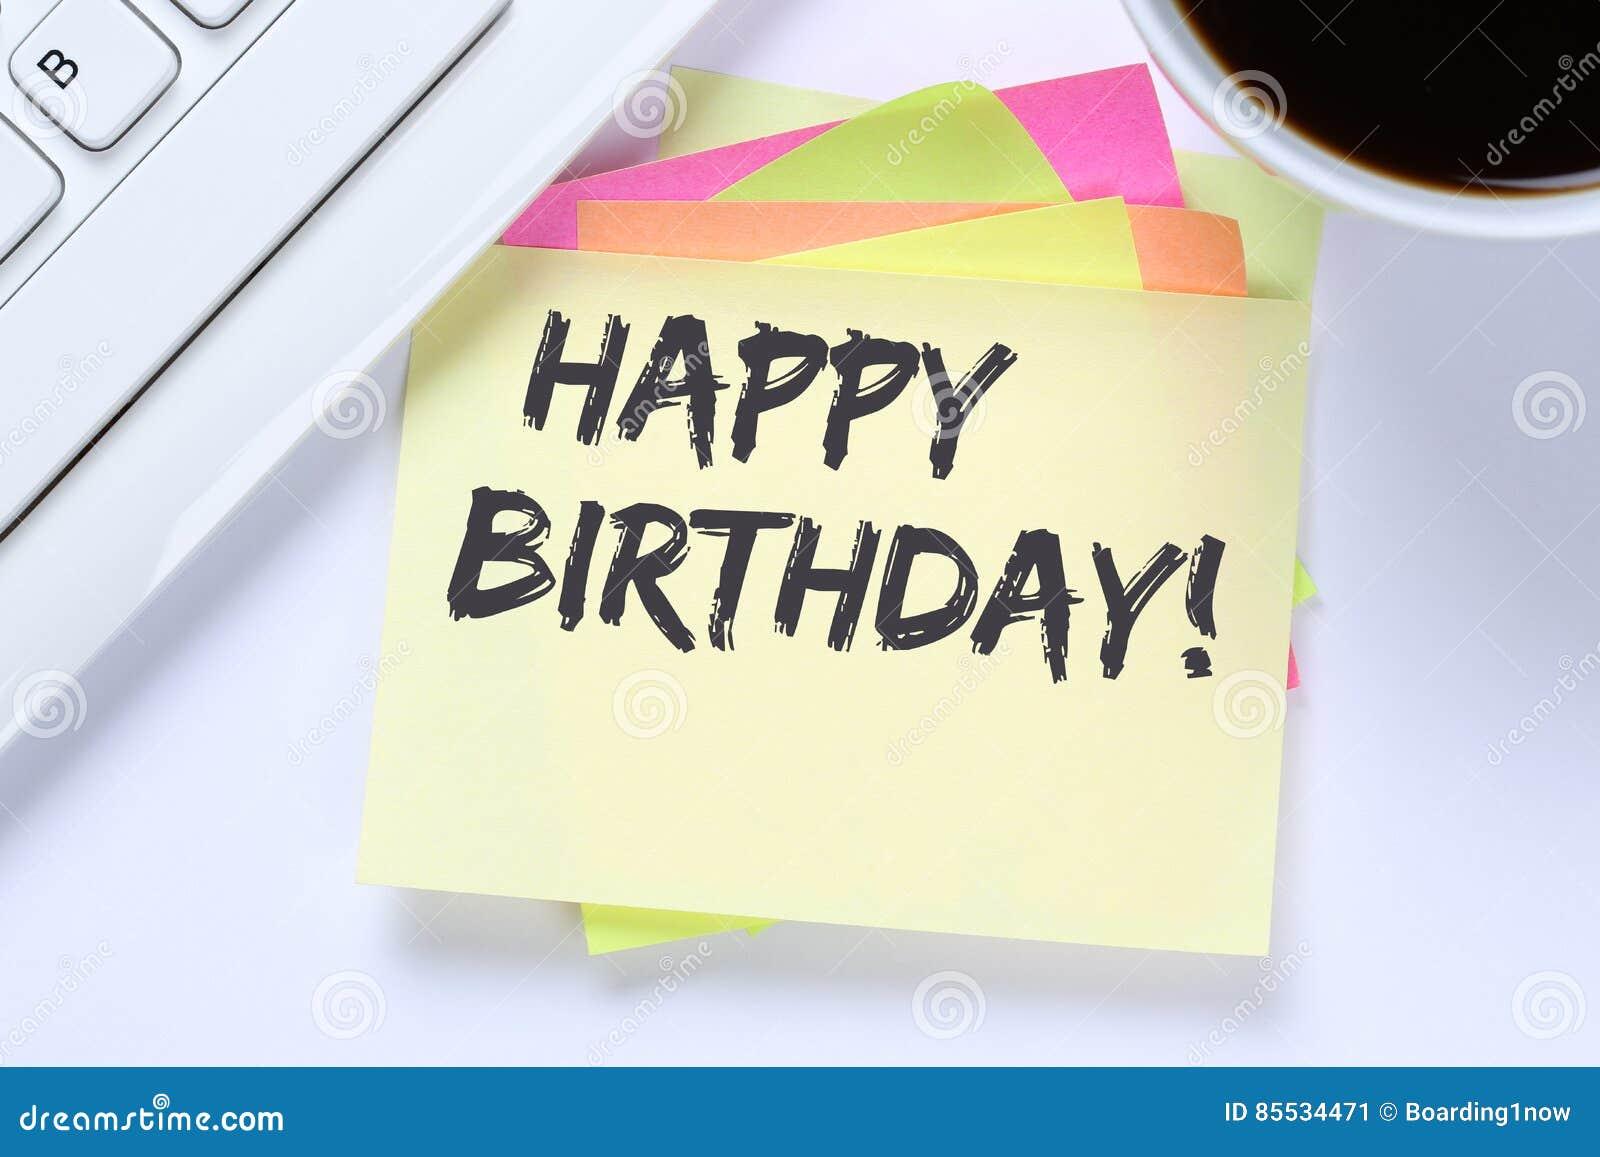 Happy Birthday Greetings Celebration Business Desk Stock Image